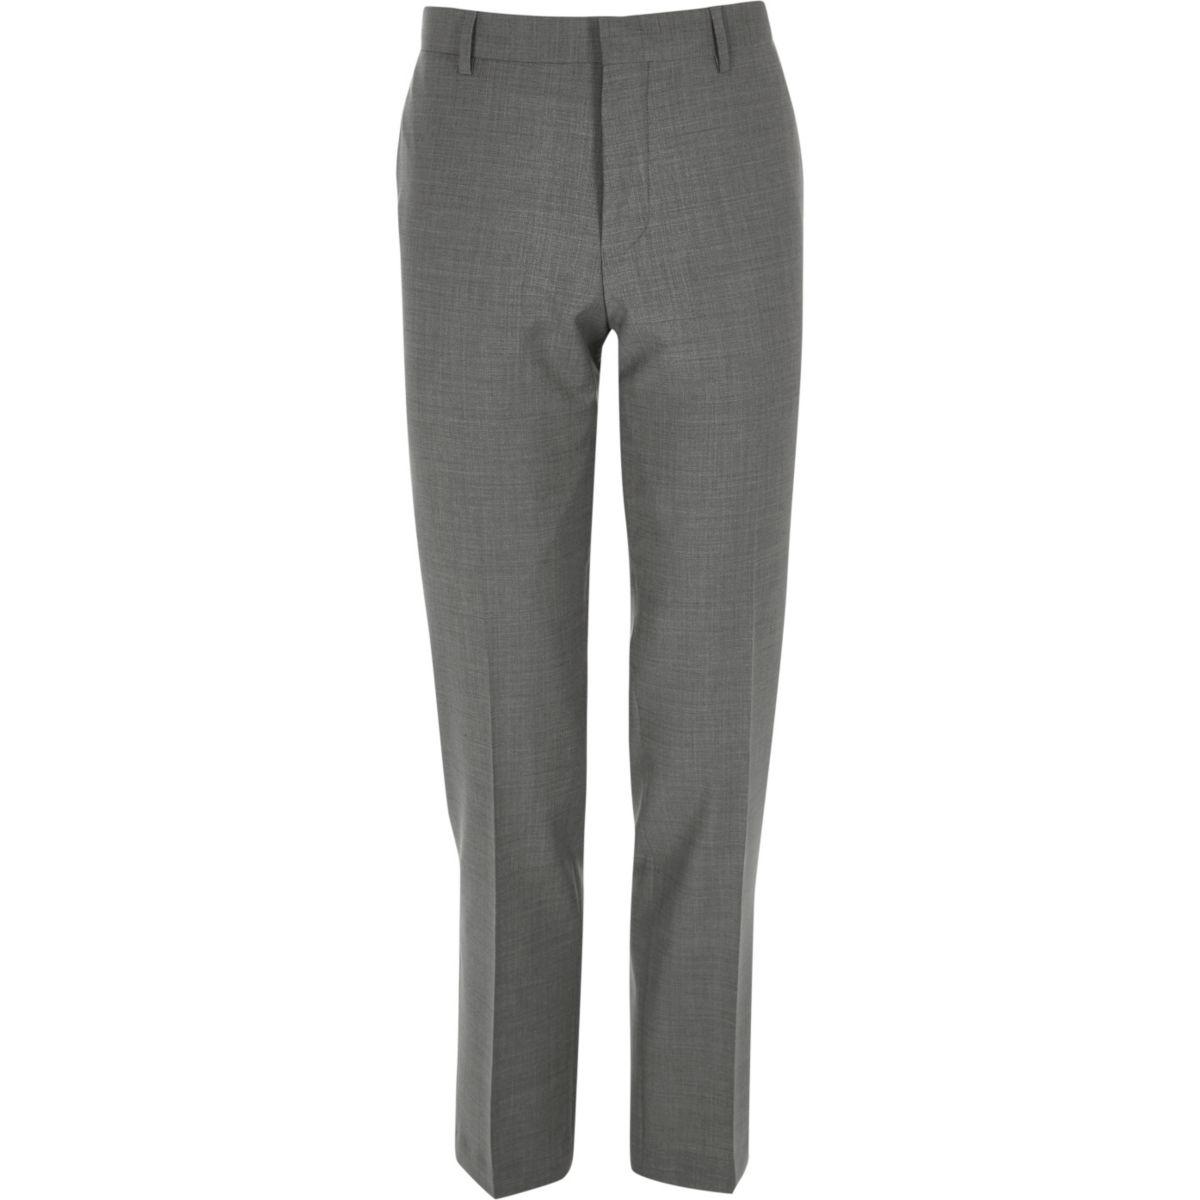 Grey slim Travel Suit pants